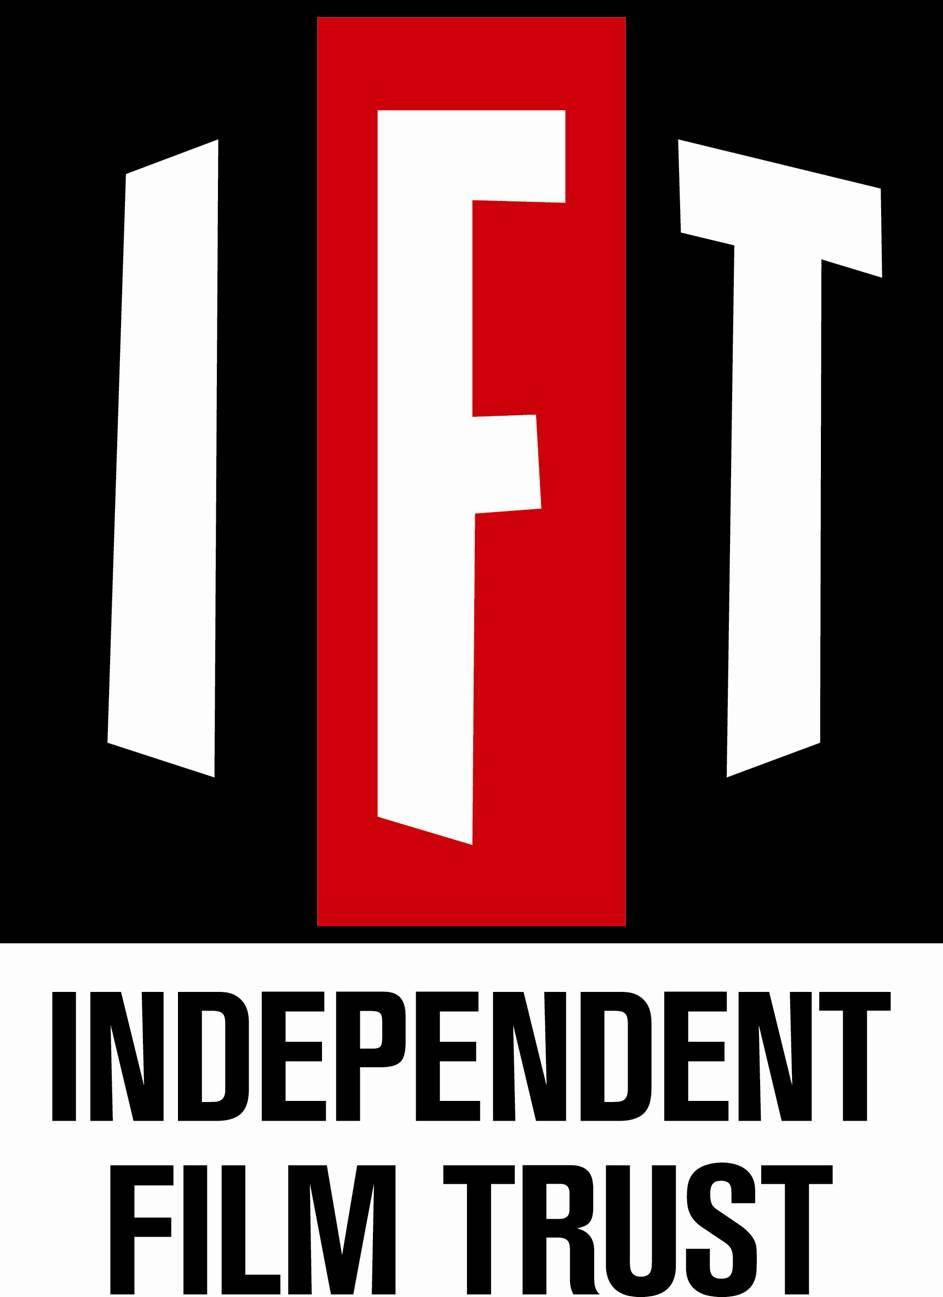 Independent Film Quarterly - Wikipedia